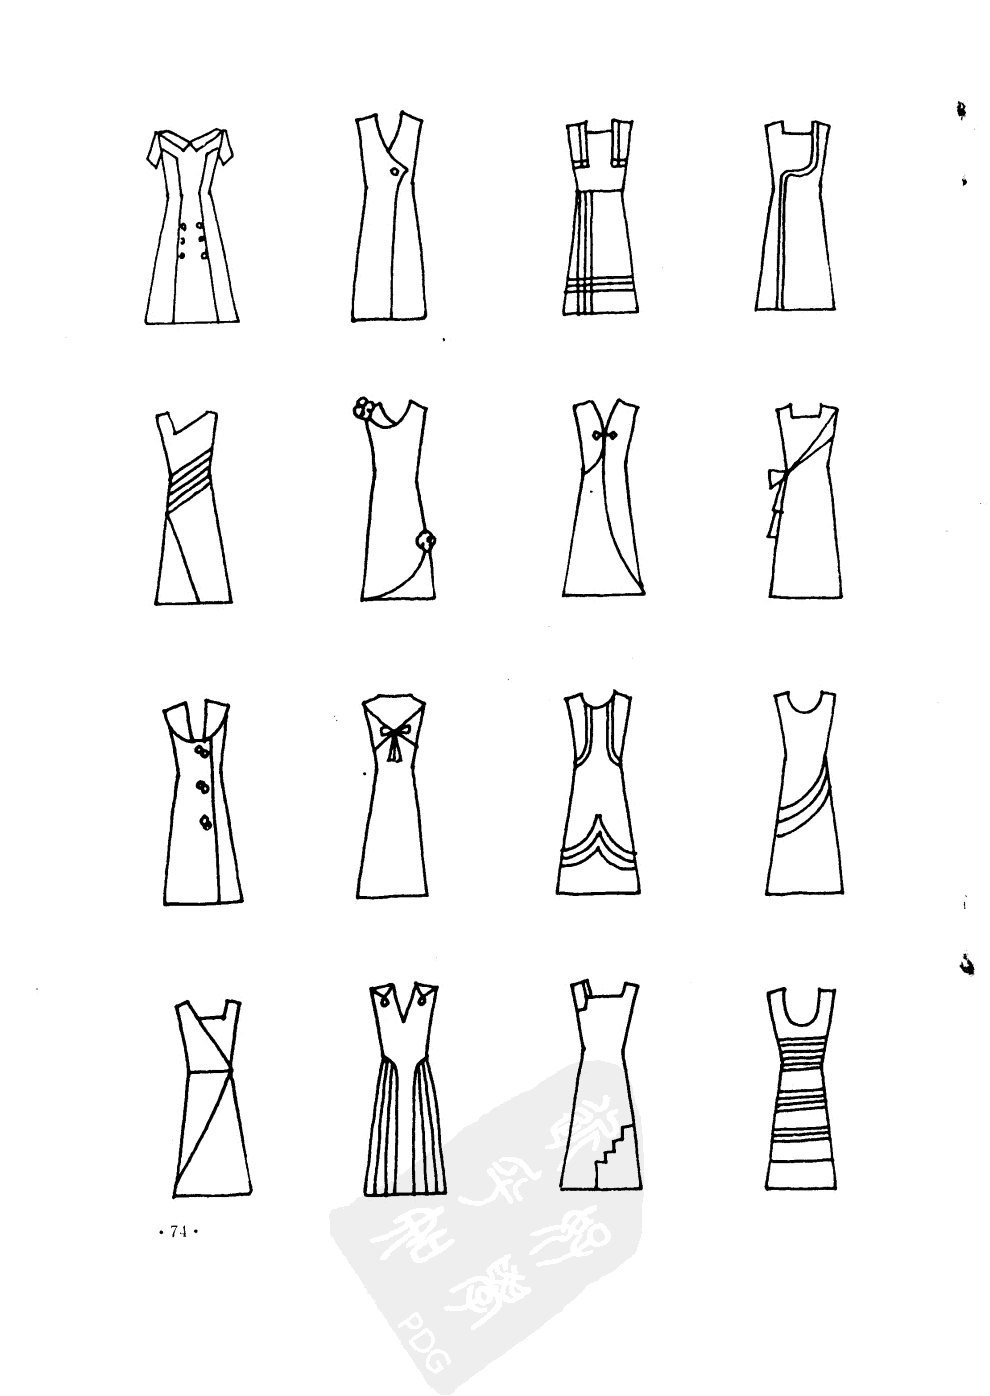 clothing styles | Мода | Pinterest | Moda, Moldes y Faldas